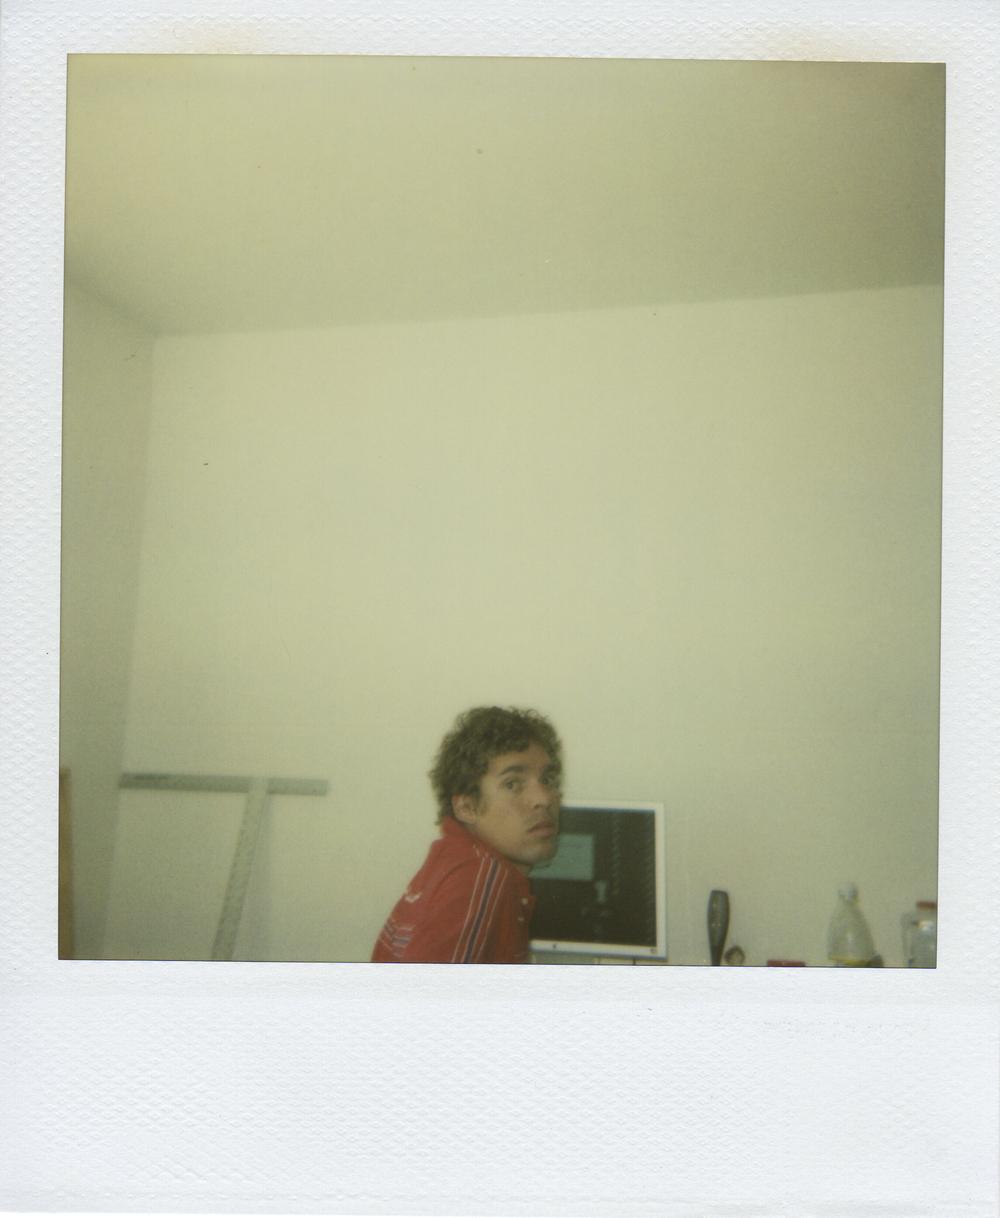 jlaurence-polaroid-067.jpg